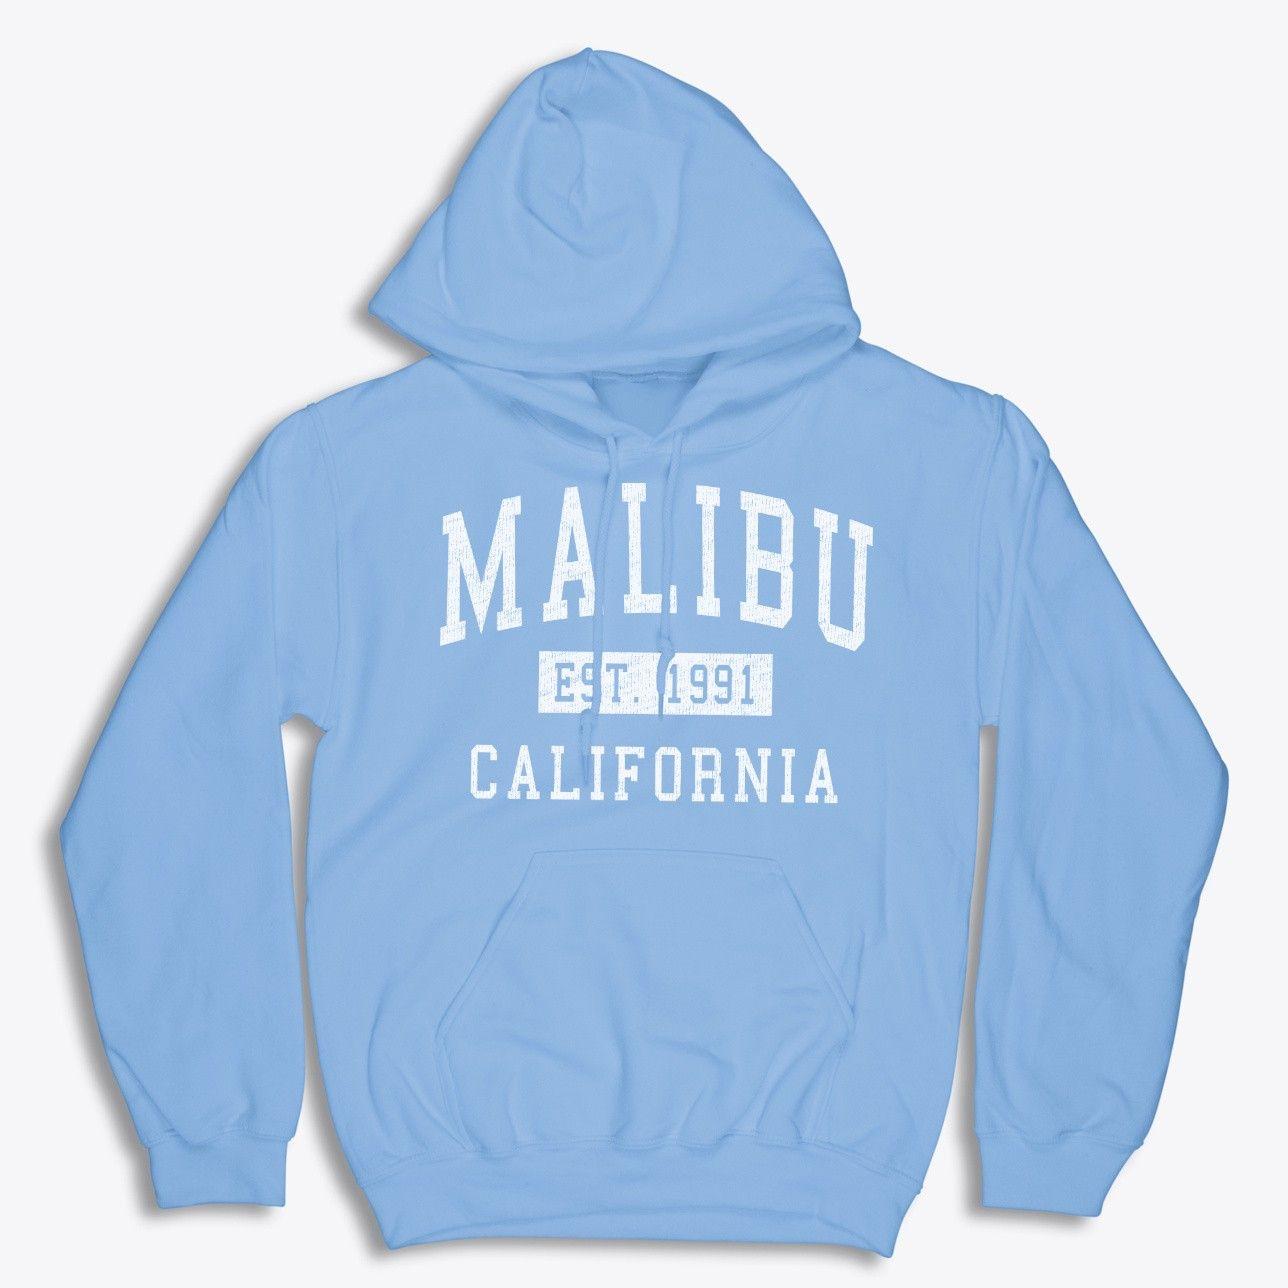 Malibu California Classic Established Crewneck Sweatshirt Sweatshirts Sweatshirts Hoodie Mens Outfits [ 1288 x 1288 Pixel ]